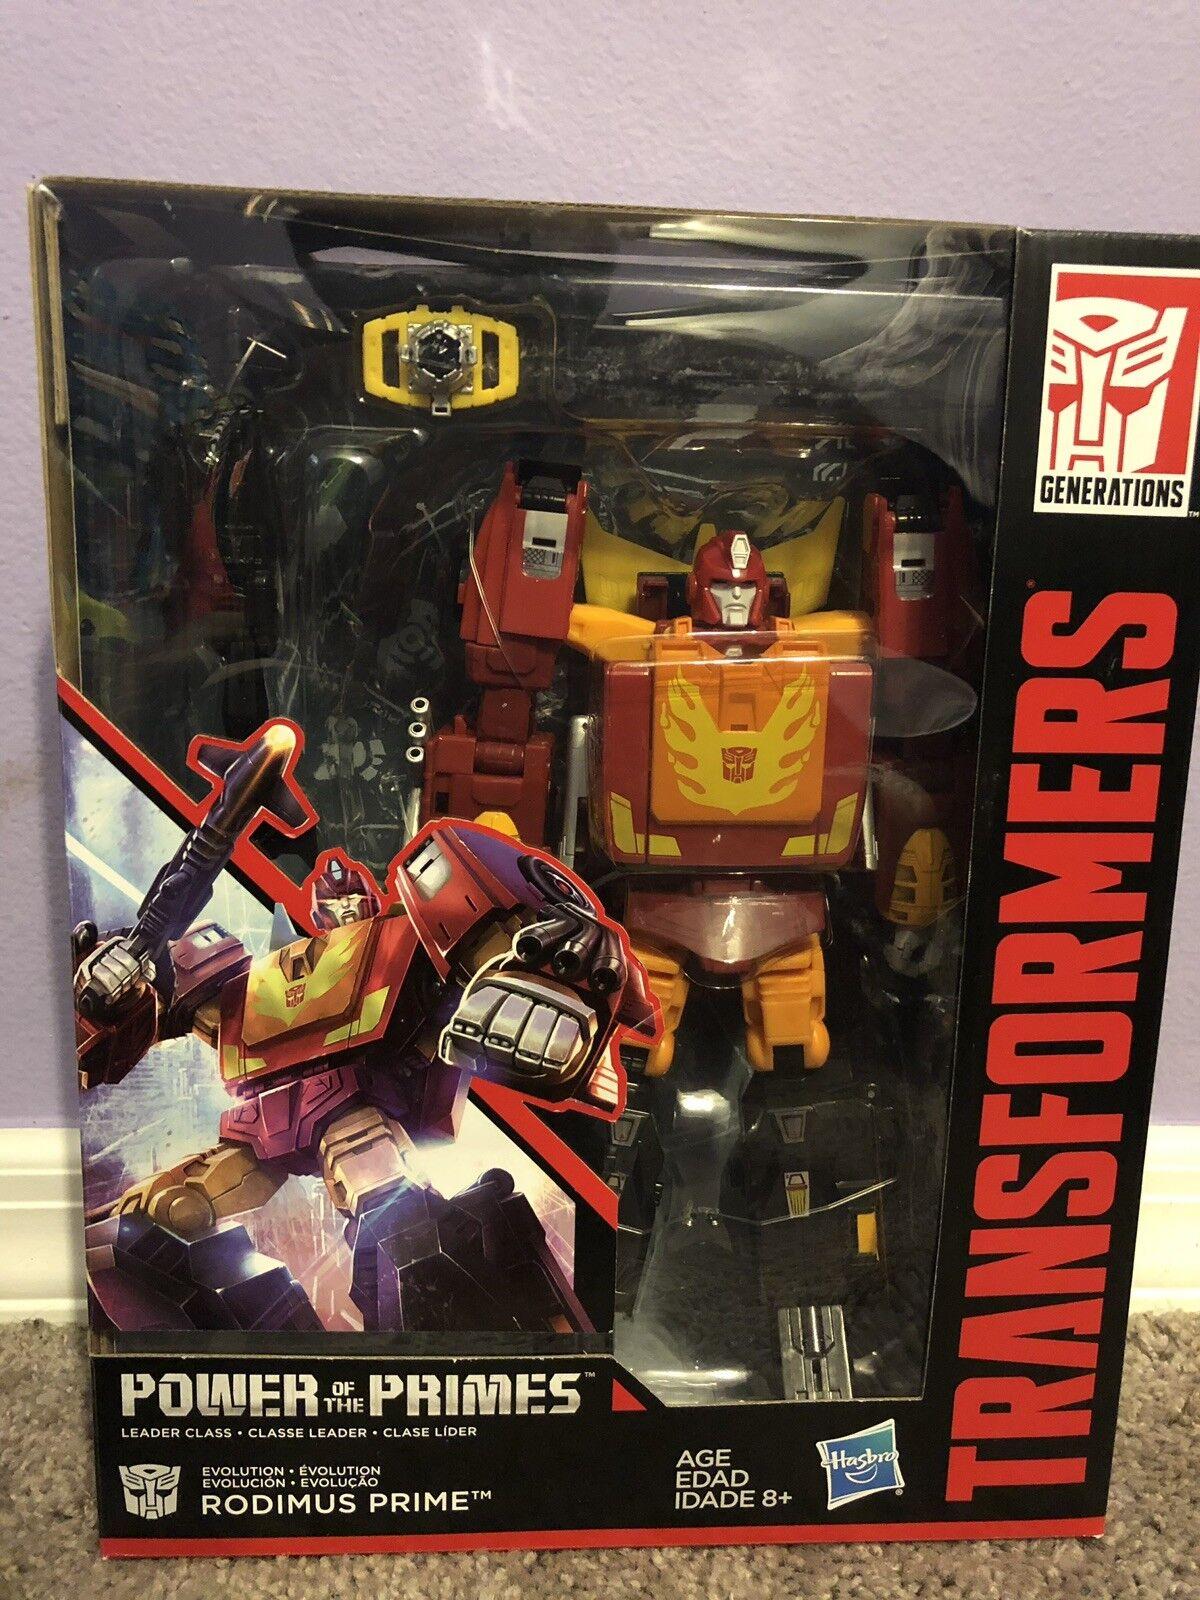 Transformers  Generations energia of the Primes Leader Evolution Rodimus Prime